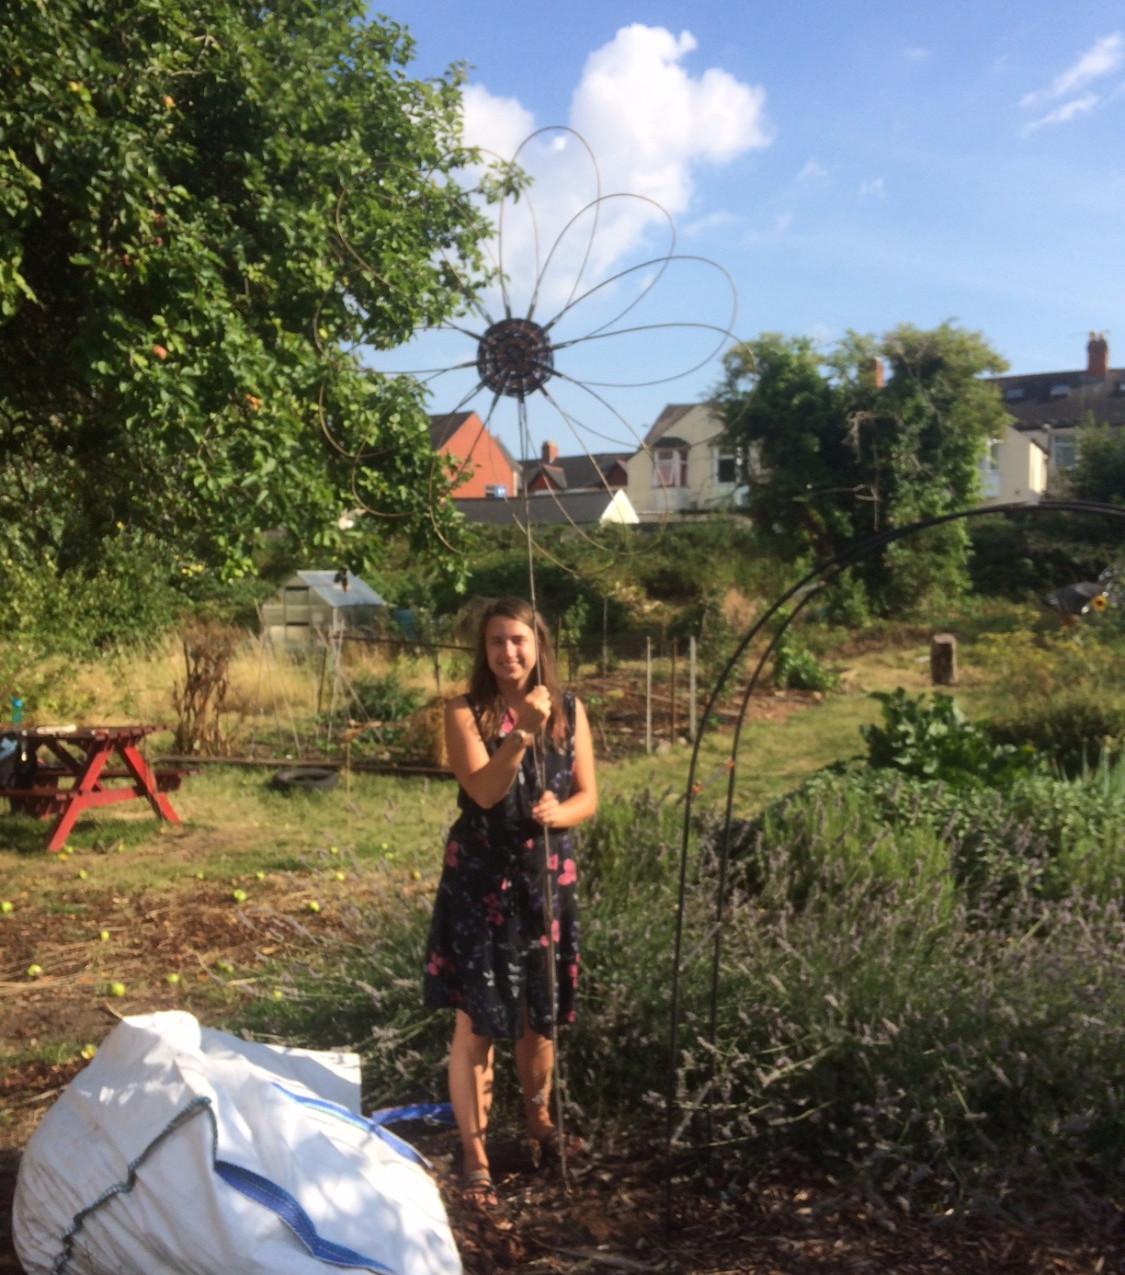 Imogen with her sunflower